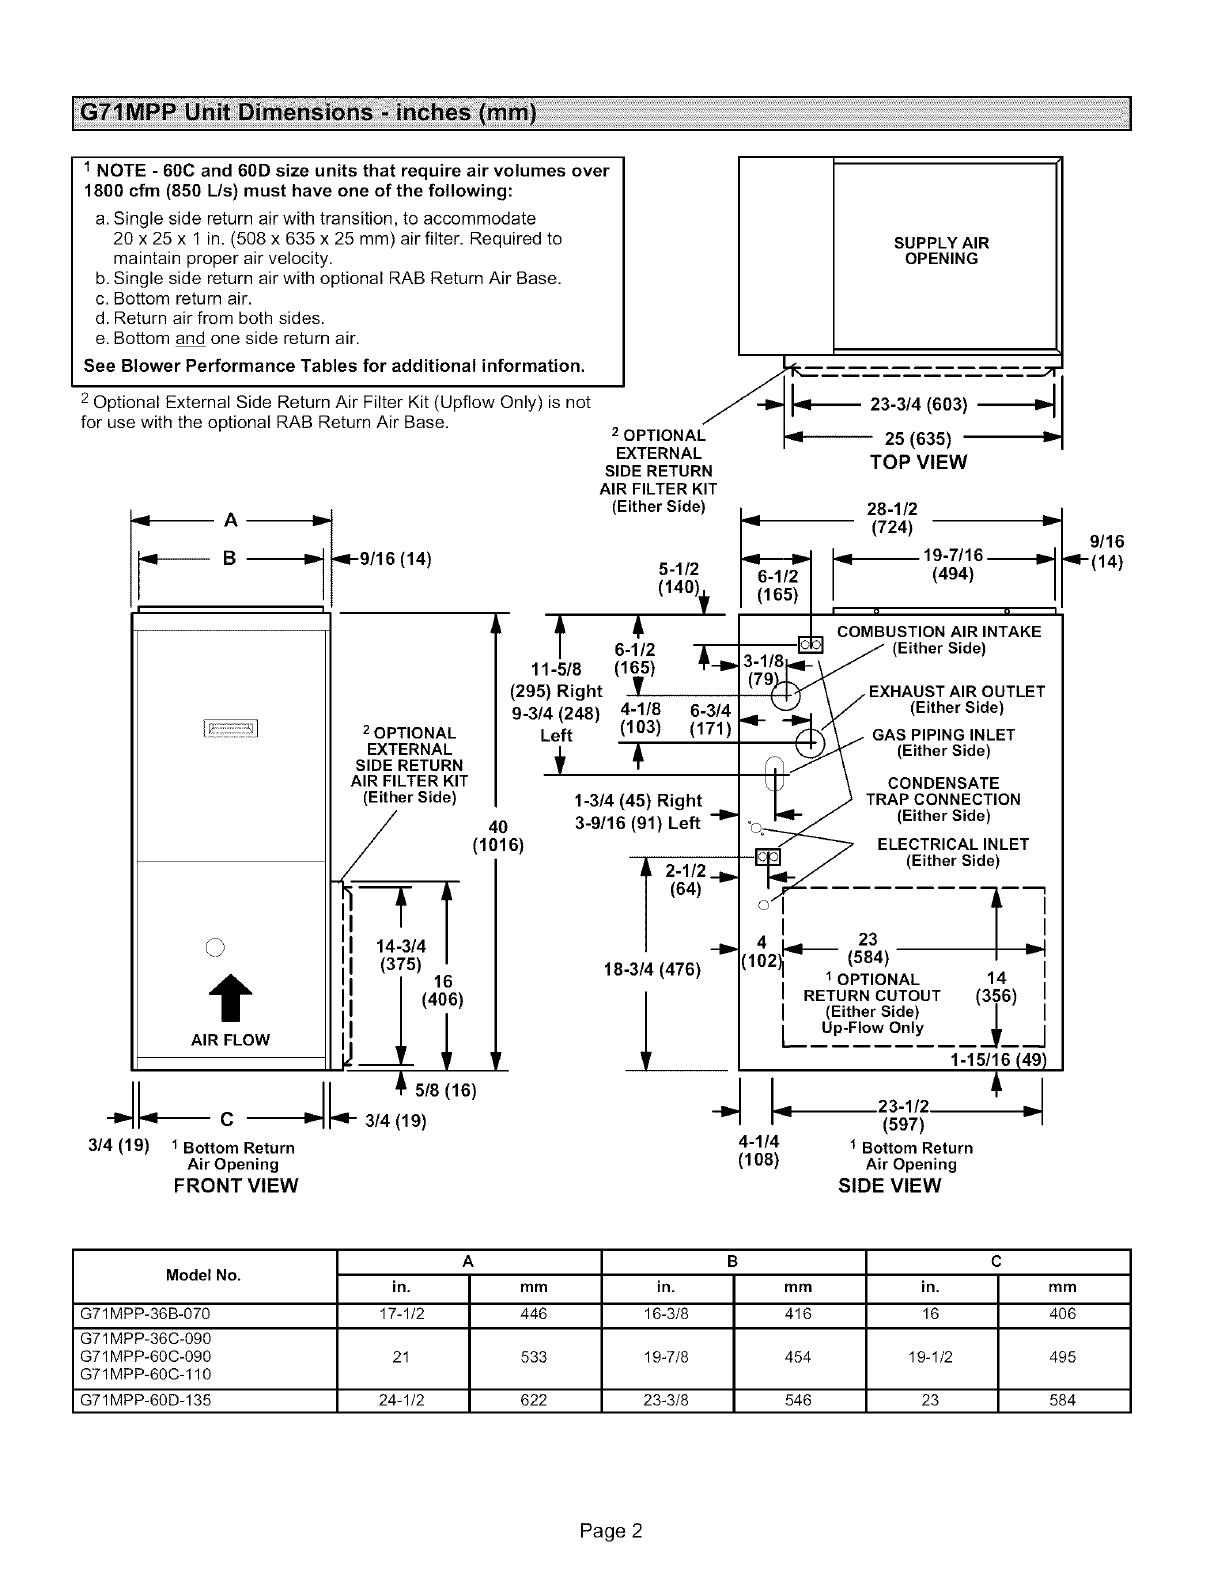 Lennox Furnace Wiring Diagram 16 G - Wiring Diagrams Hidden on